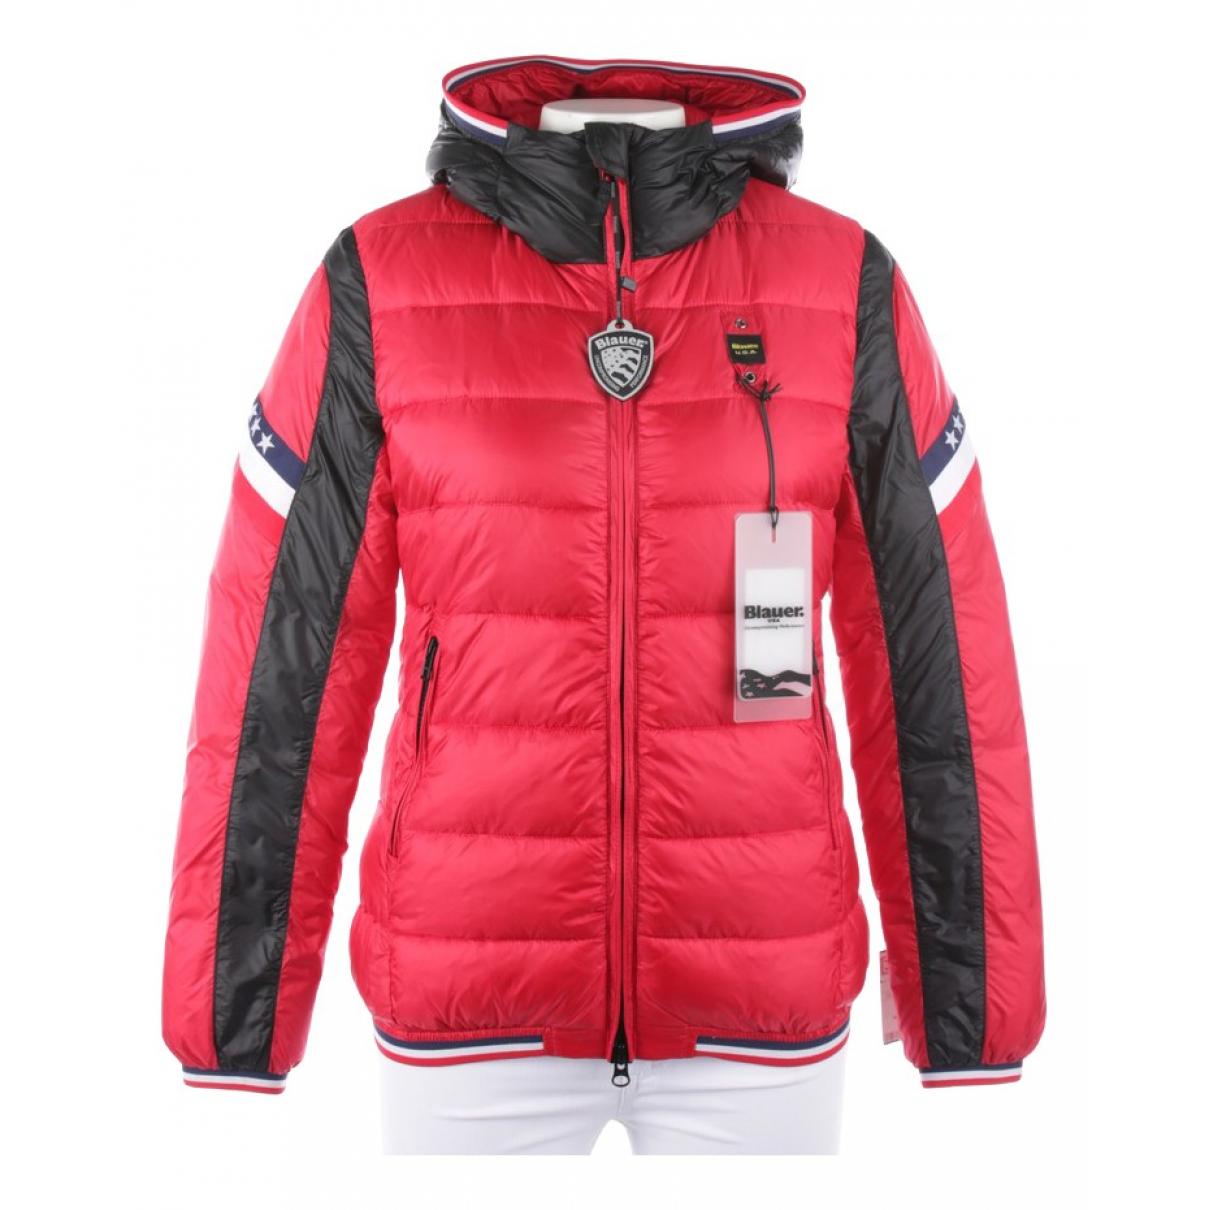 Blauer \N Multicolour jacket for Women 34 FR